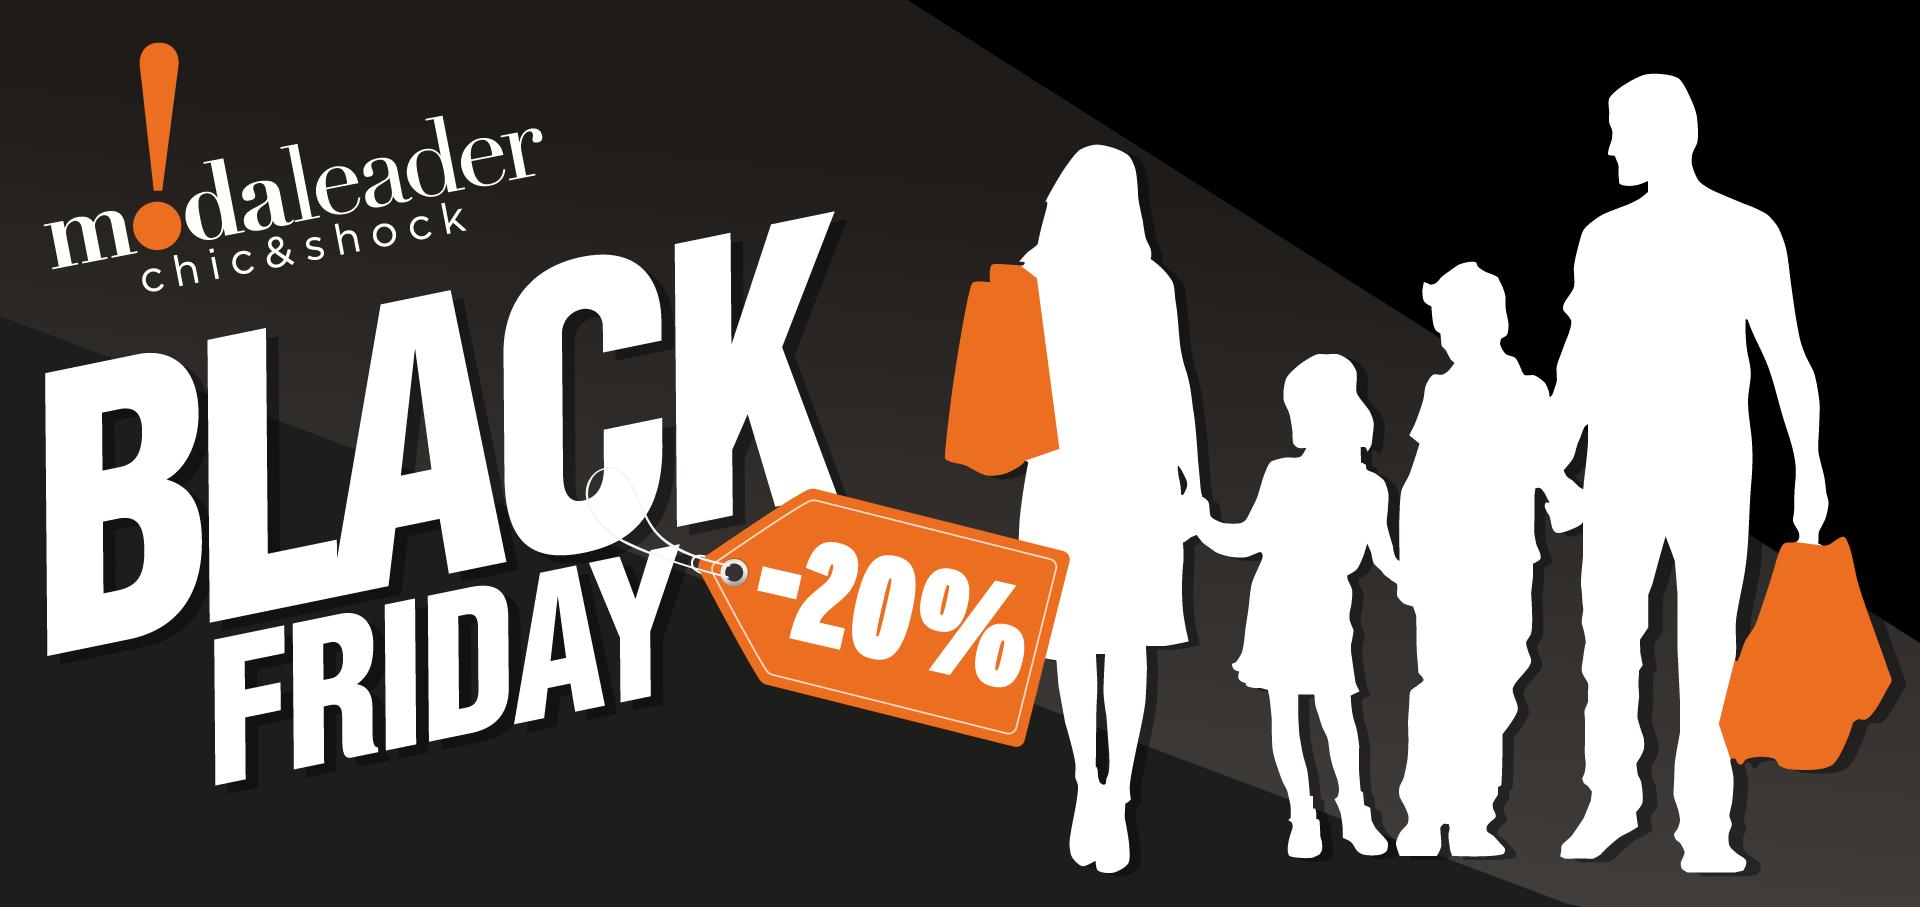 banner-sito-modaleader-black-friday